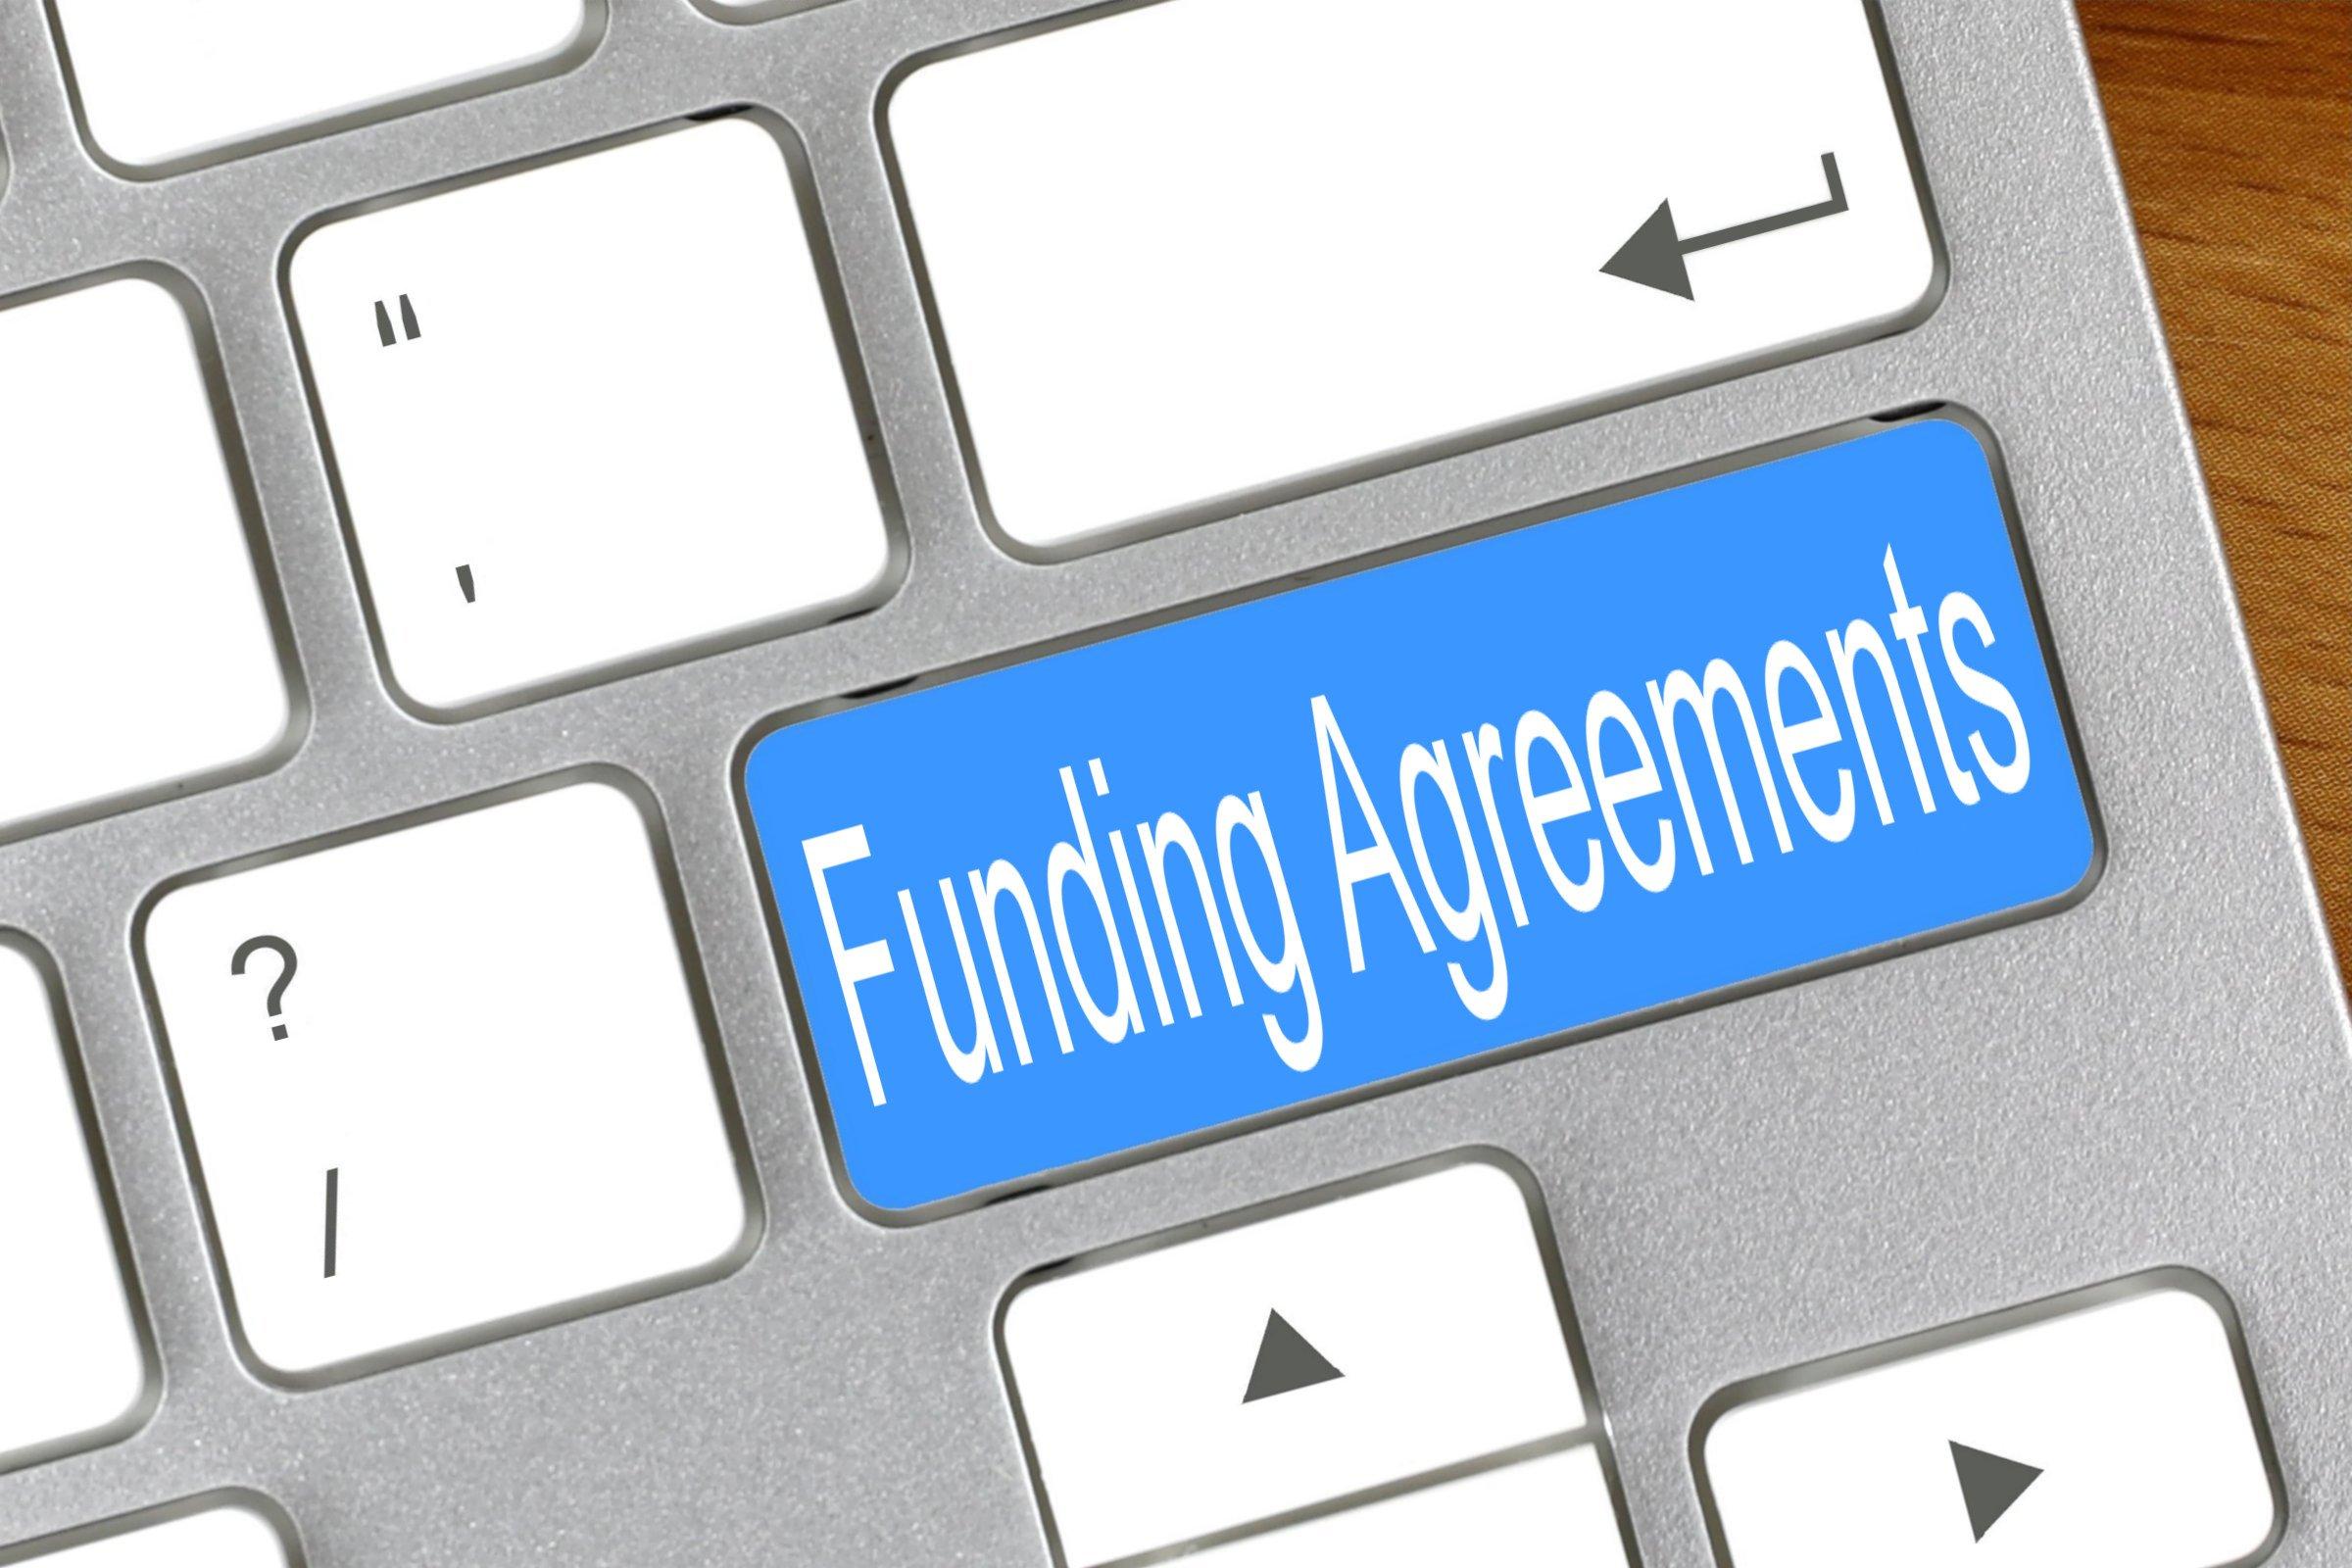 Funding Agreements